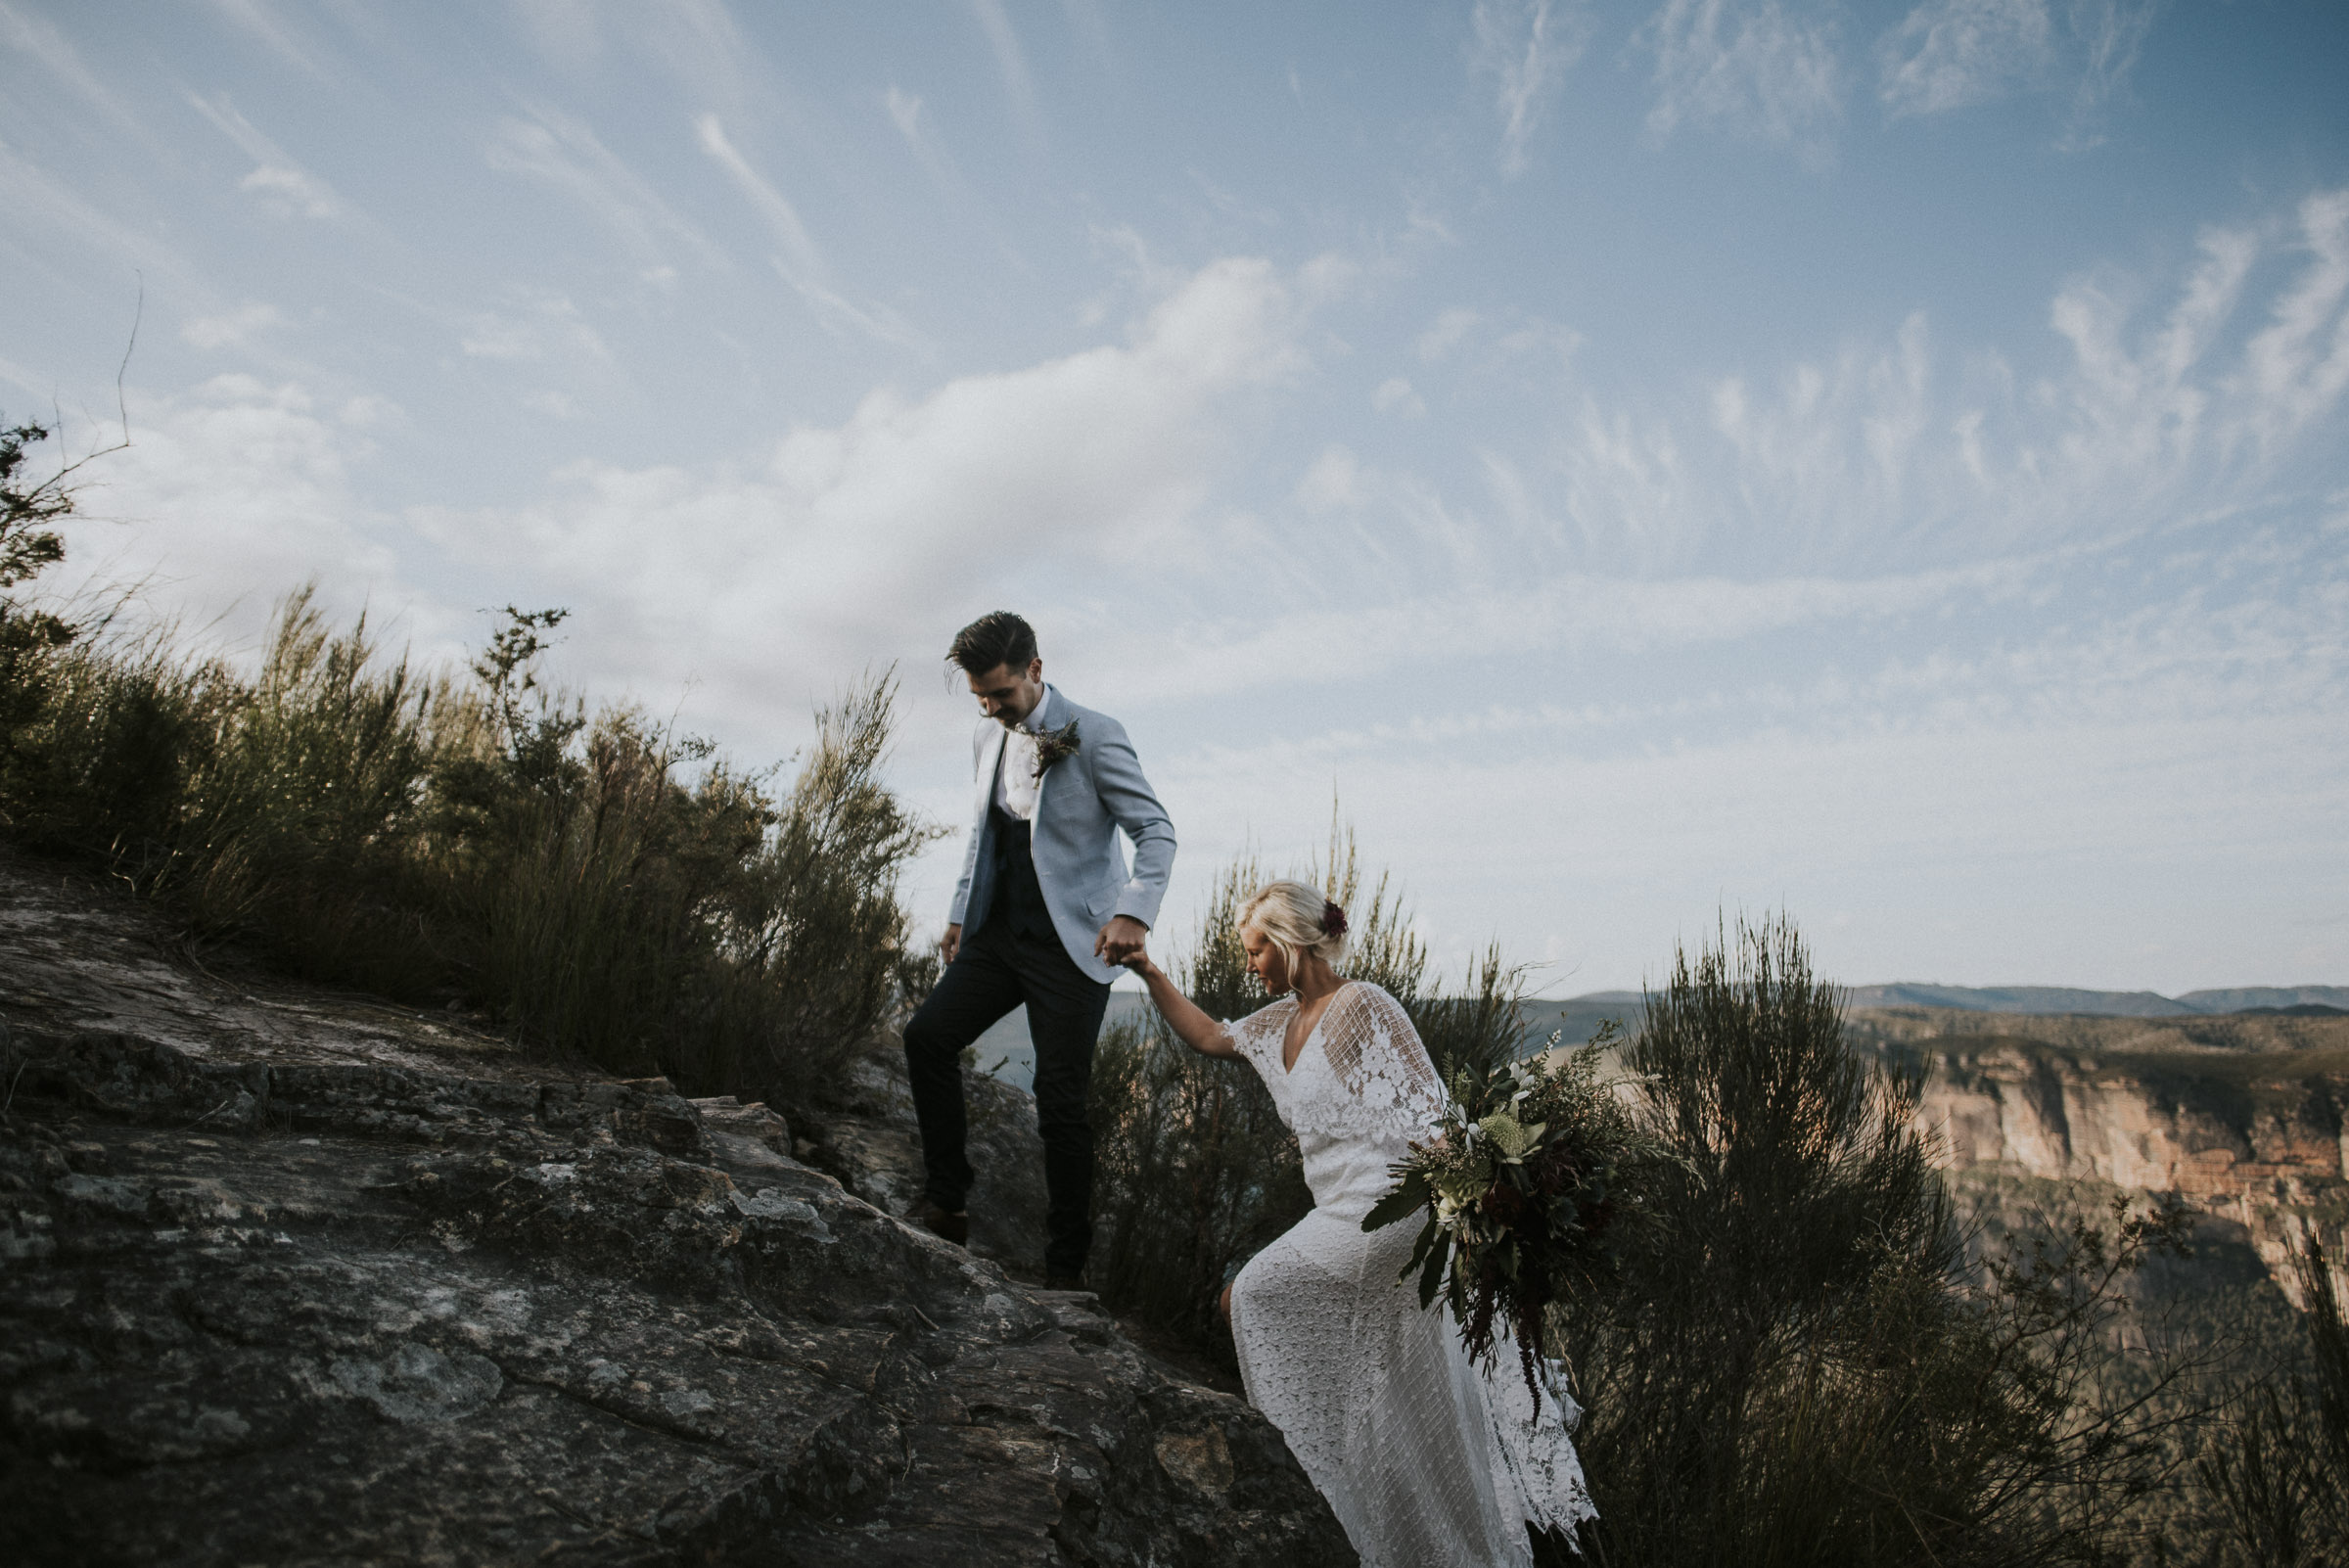 Amber_Johnny_Blue_Mountains_Elopement_Anteloping-50.jpg